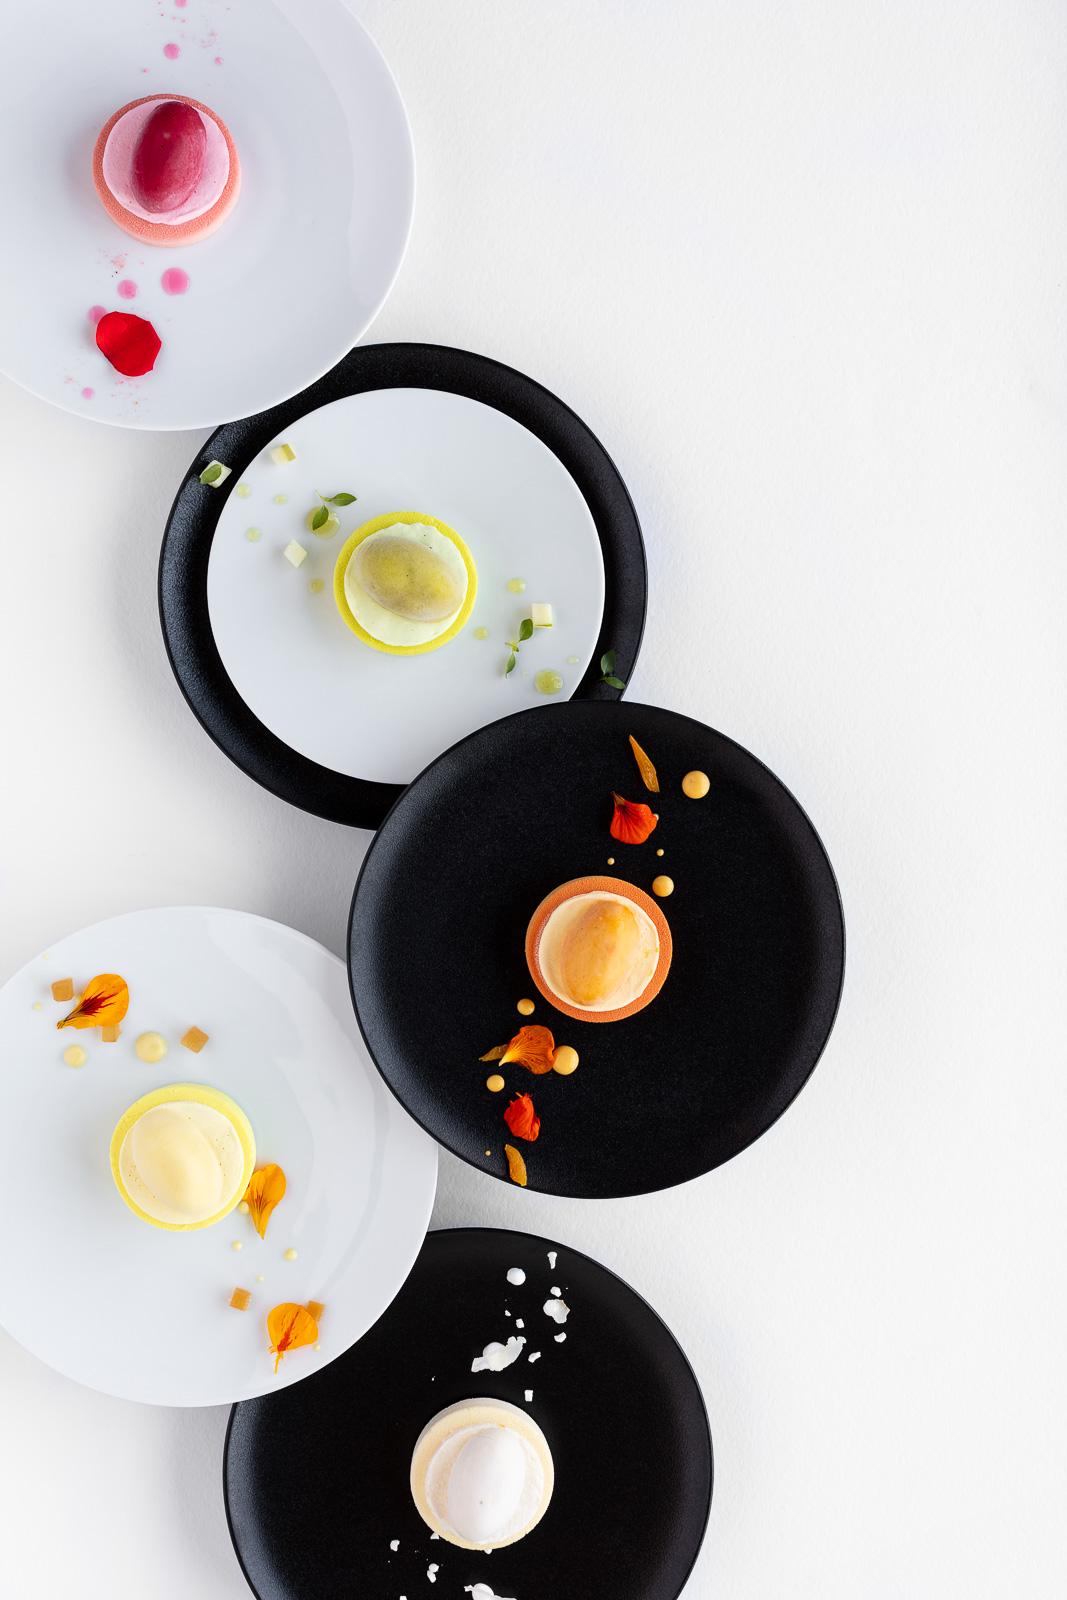 Franck_Hamel_food_photographer_photographeculinaire_valerie_paumelle_agent_st_clair_traiteur (3).jpg